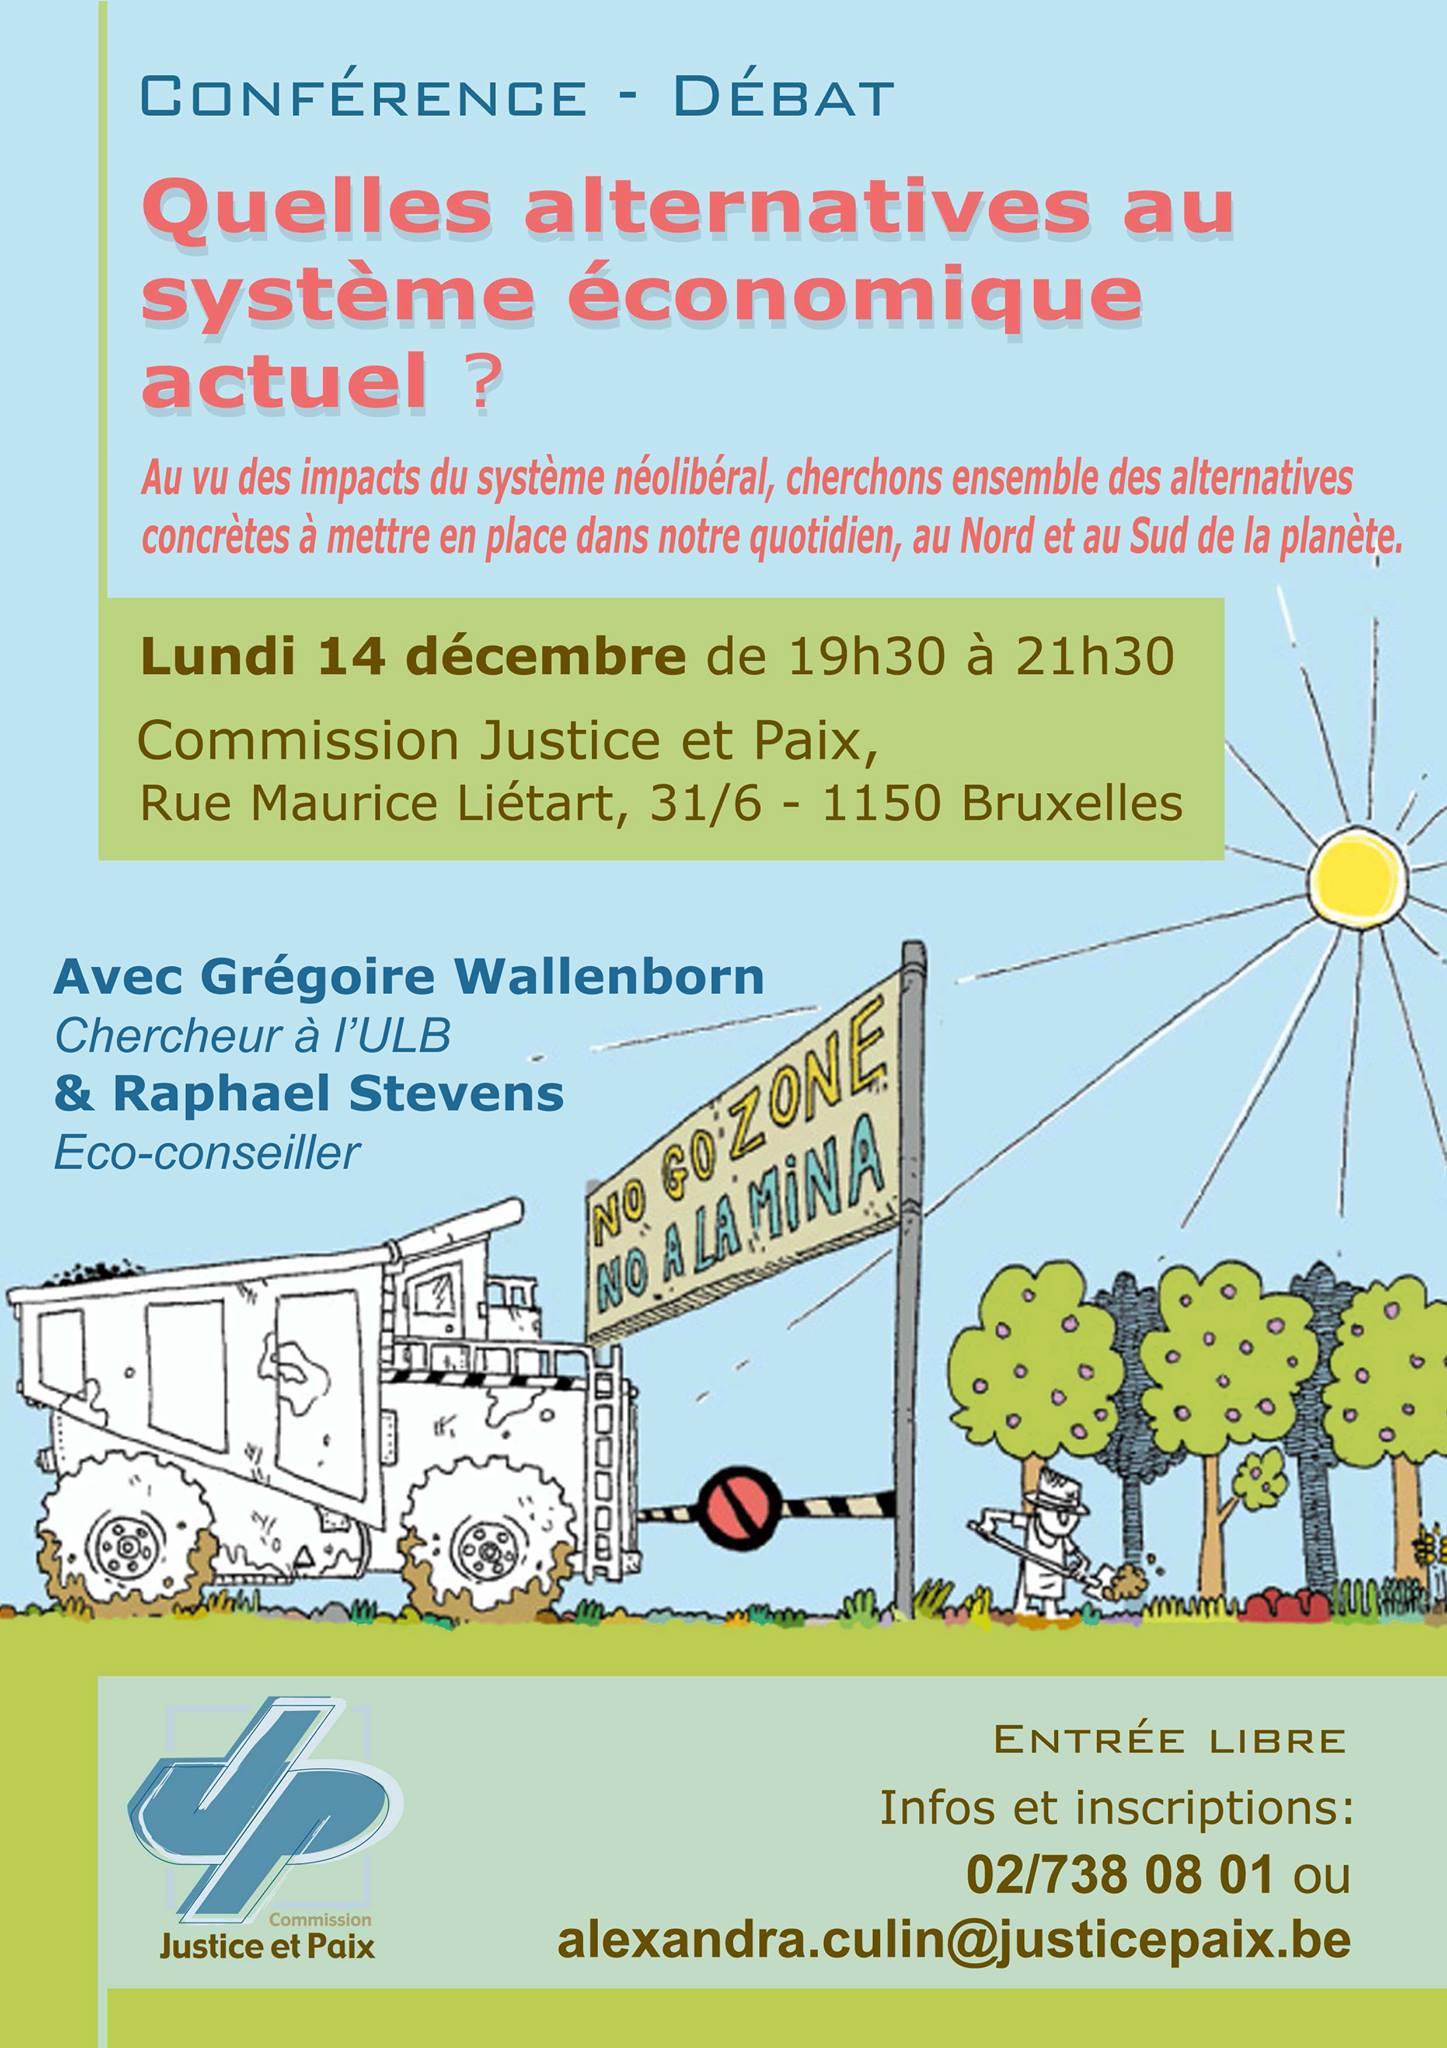 2015-12-14_quelle_atlternatives_au_systeme_actuel.jpg